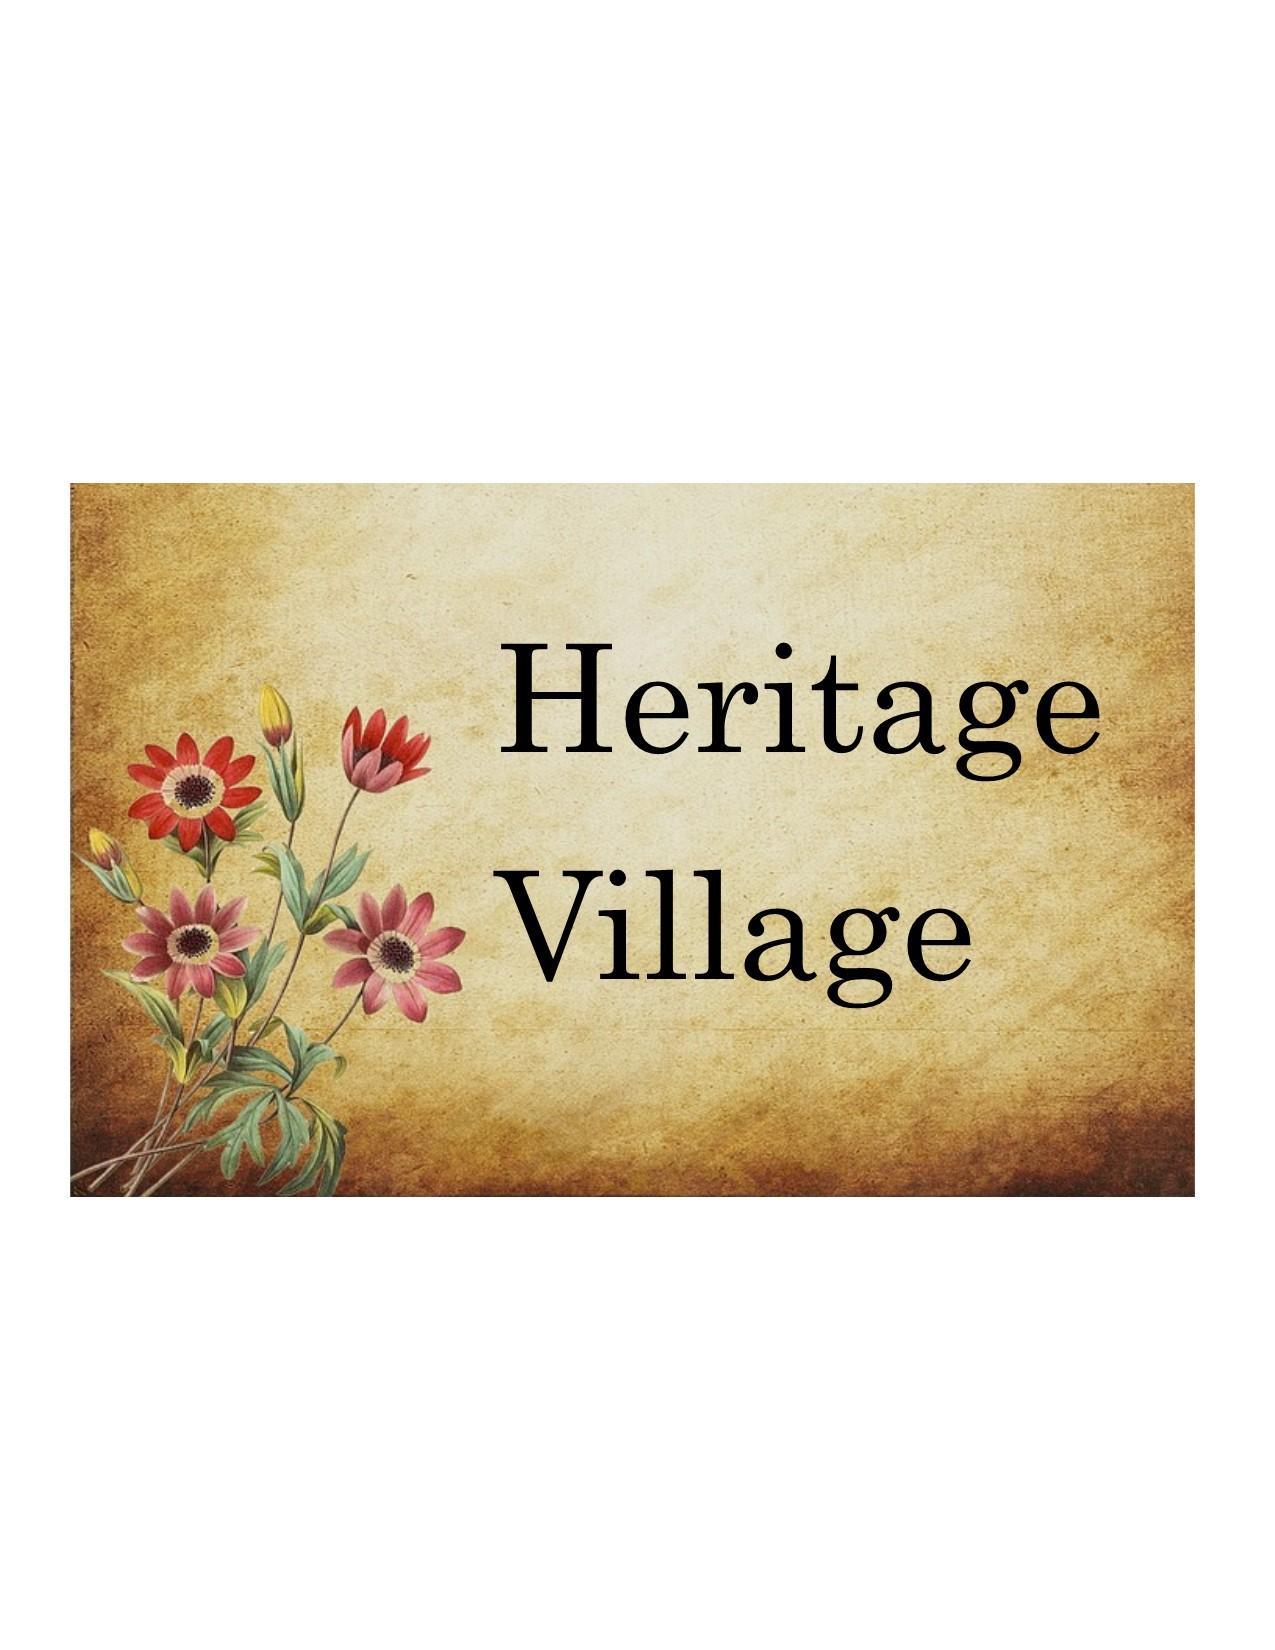 heritage village pict.jpg